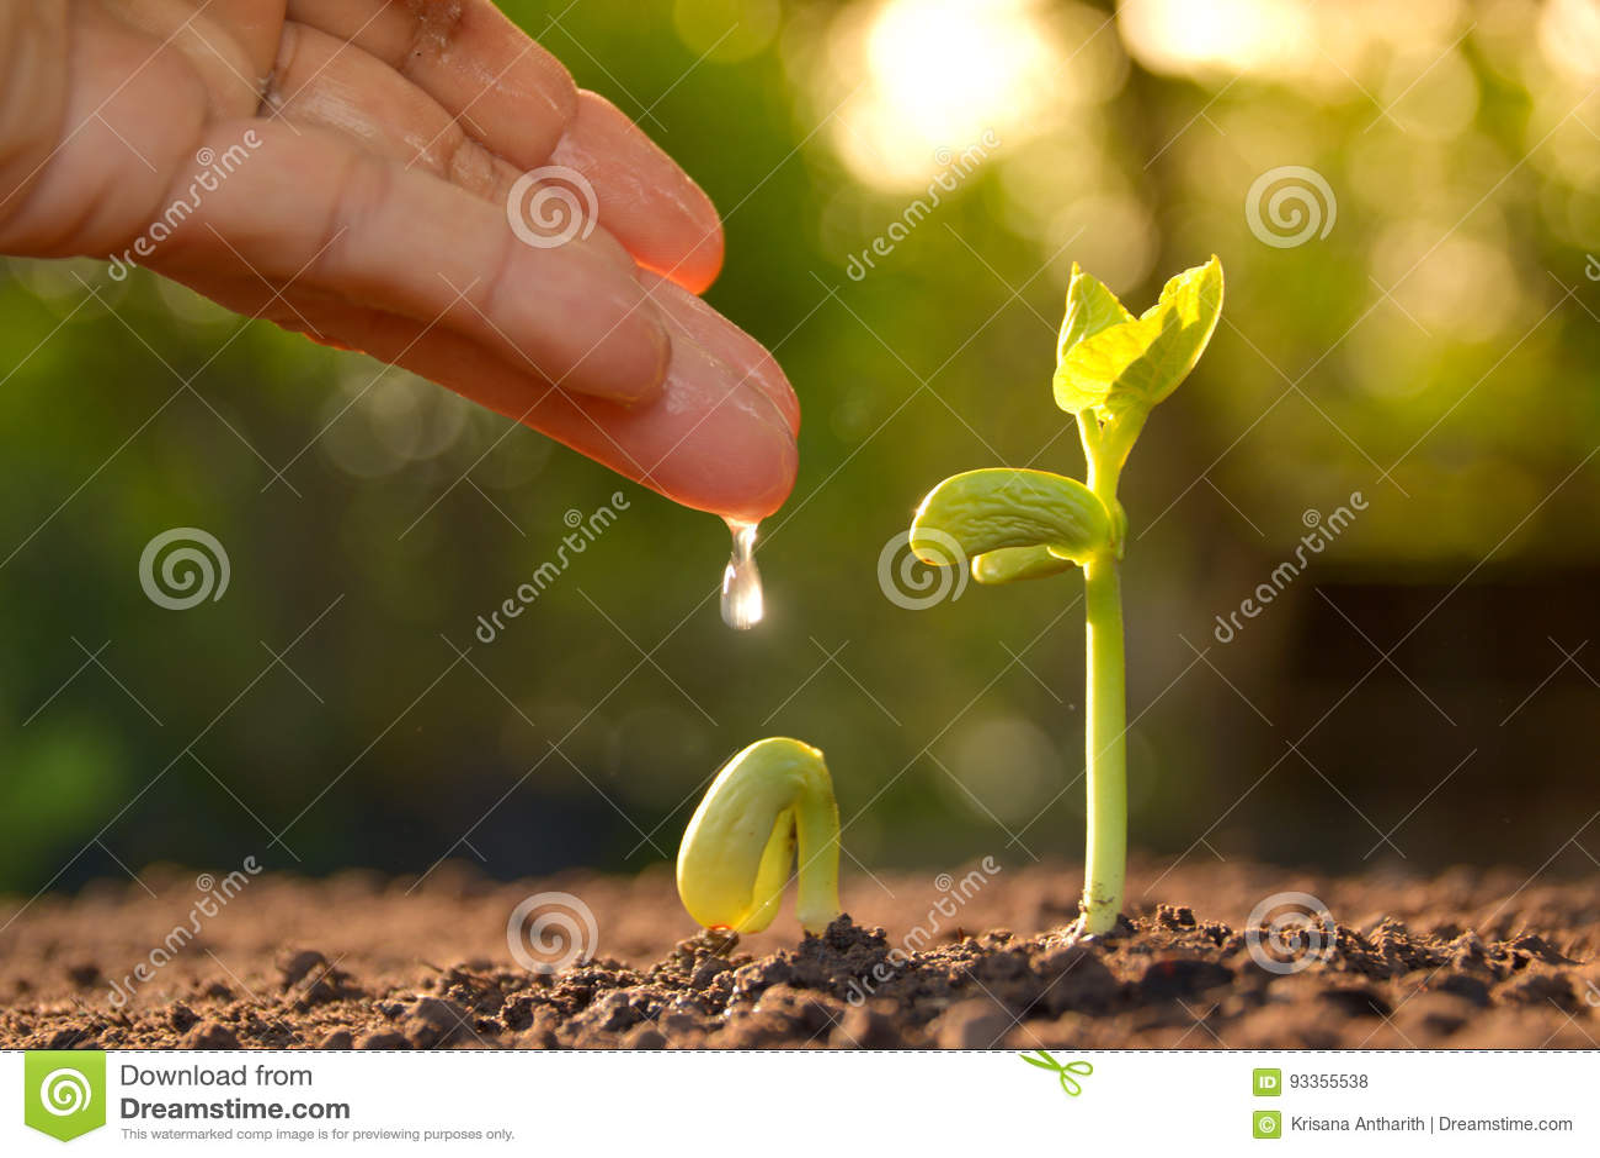 Wachsende Anlagen Betriebssämling Handernährungsund Bewässerungsyoun